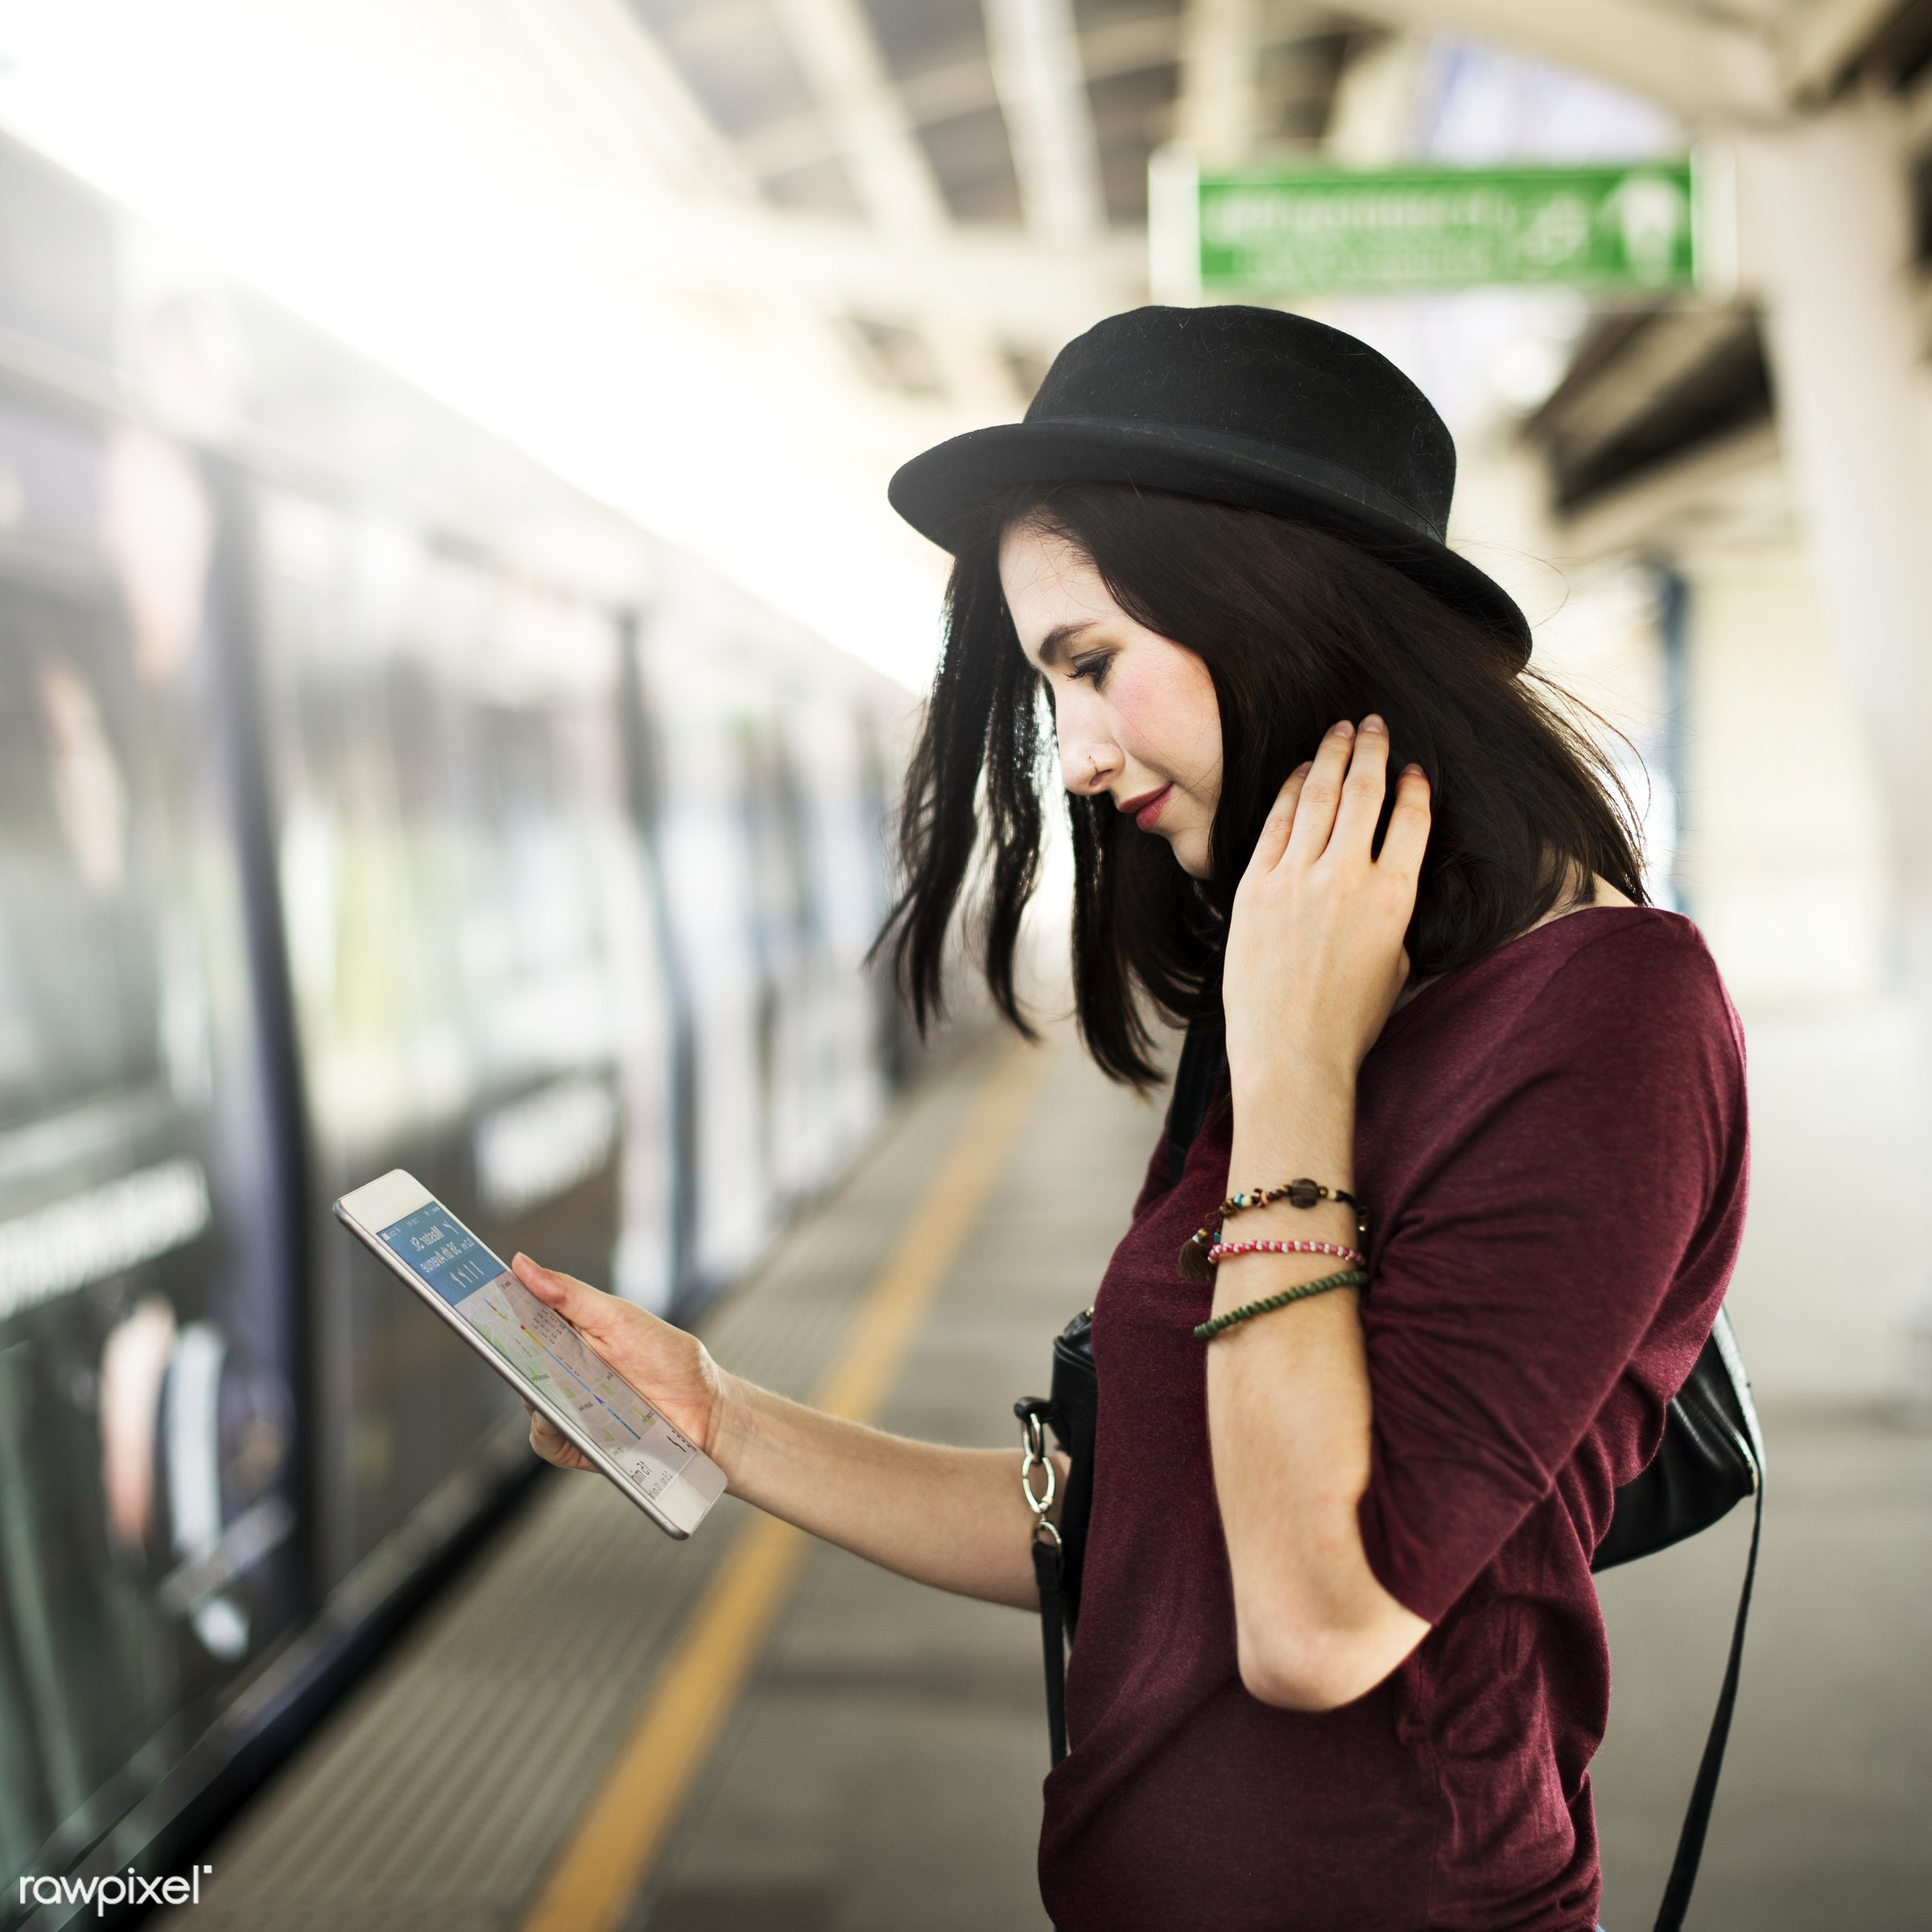 city, metro, navigate, city life, transit, casual, commuter, connection, destination, device, digital tablet, holding,...